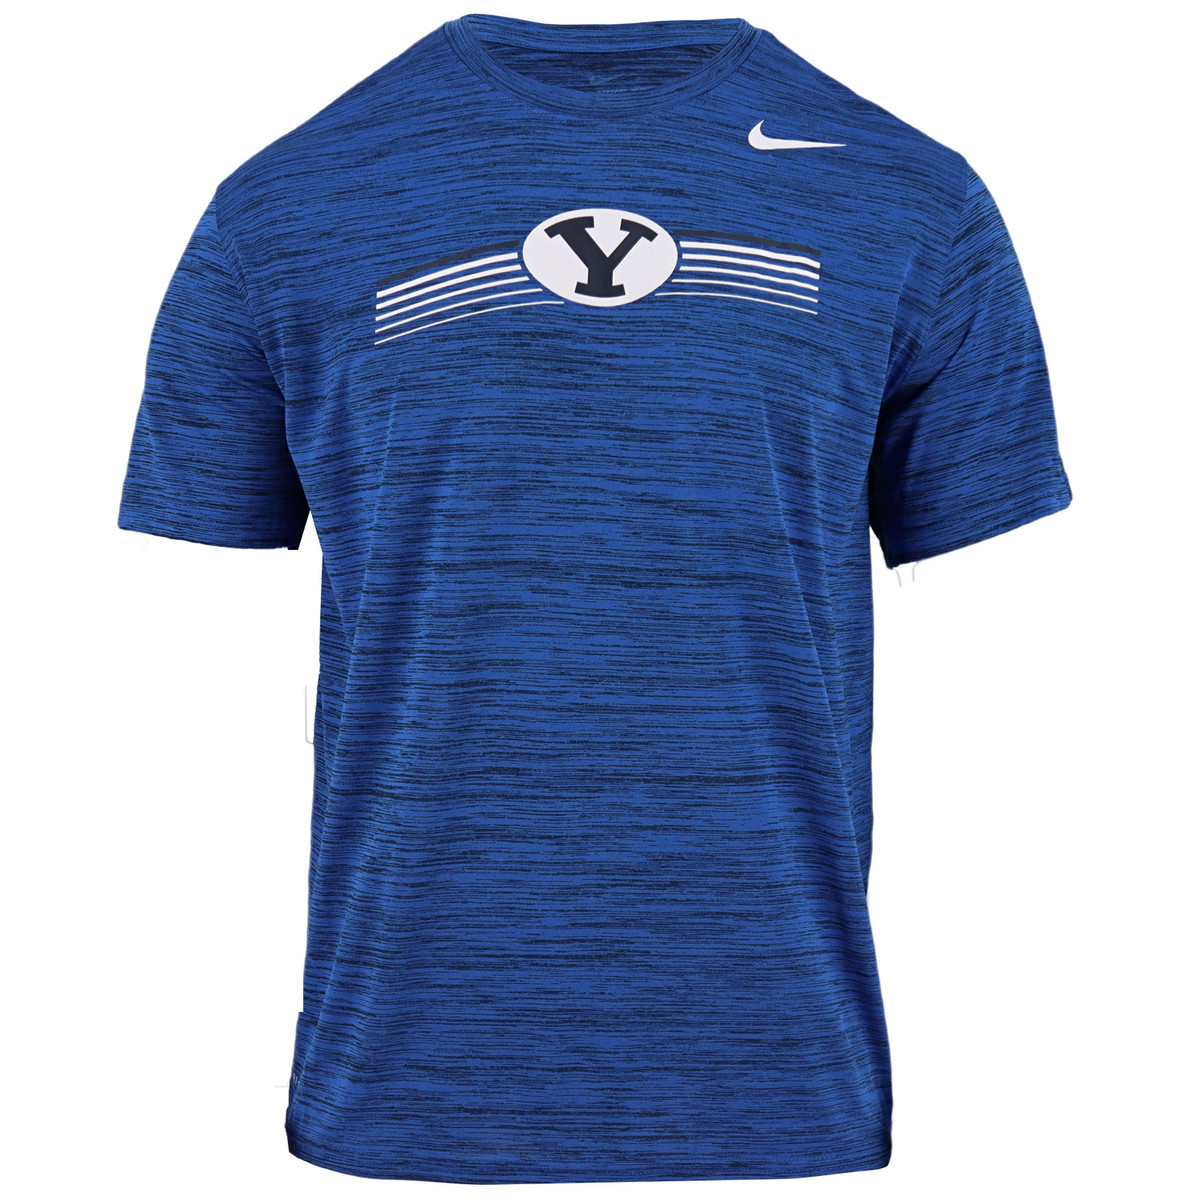 3731c4bf6d1 Dri-Fit Legend Velocity Oval Y Slanted Stripes T-Shirt - Nike